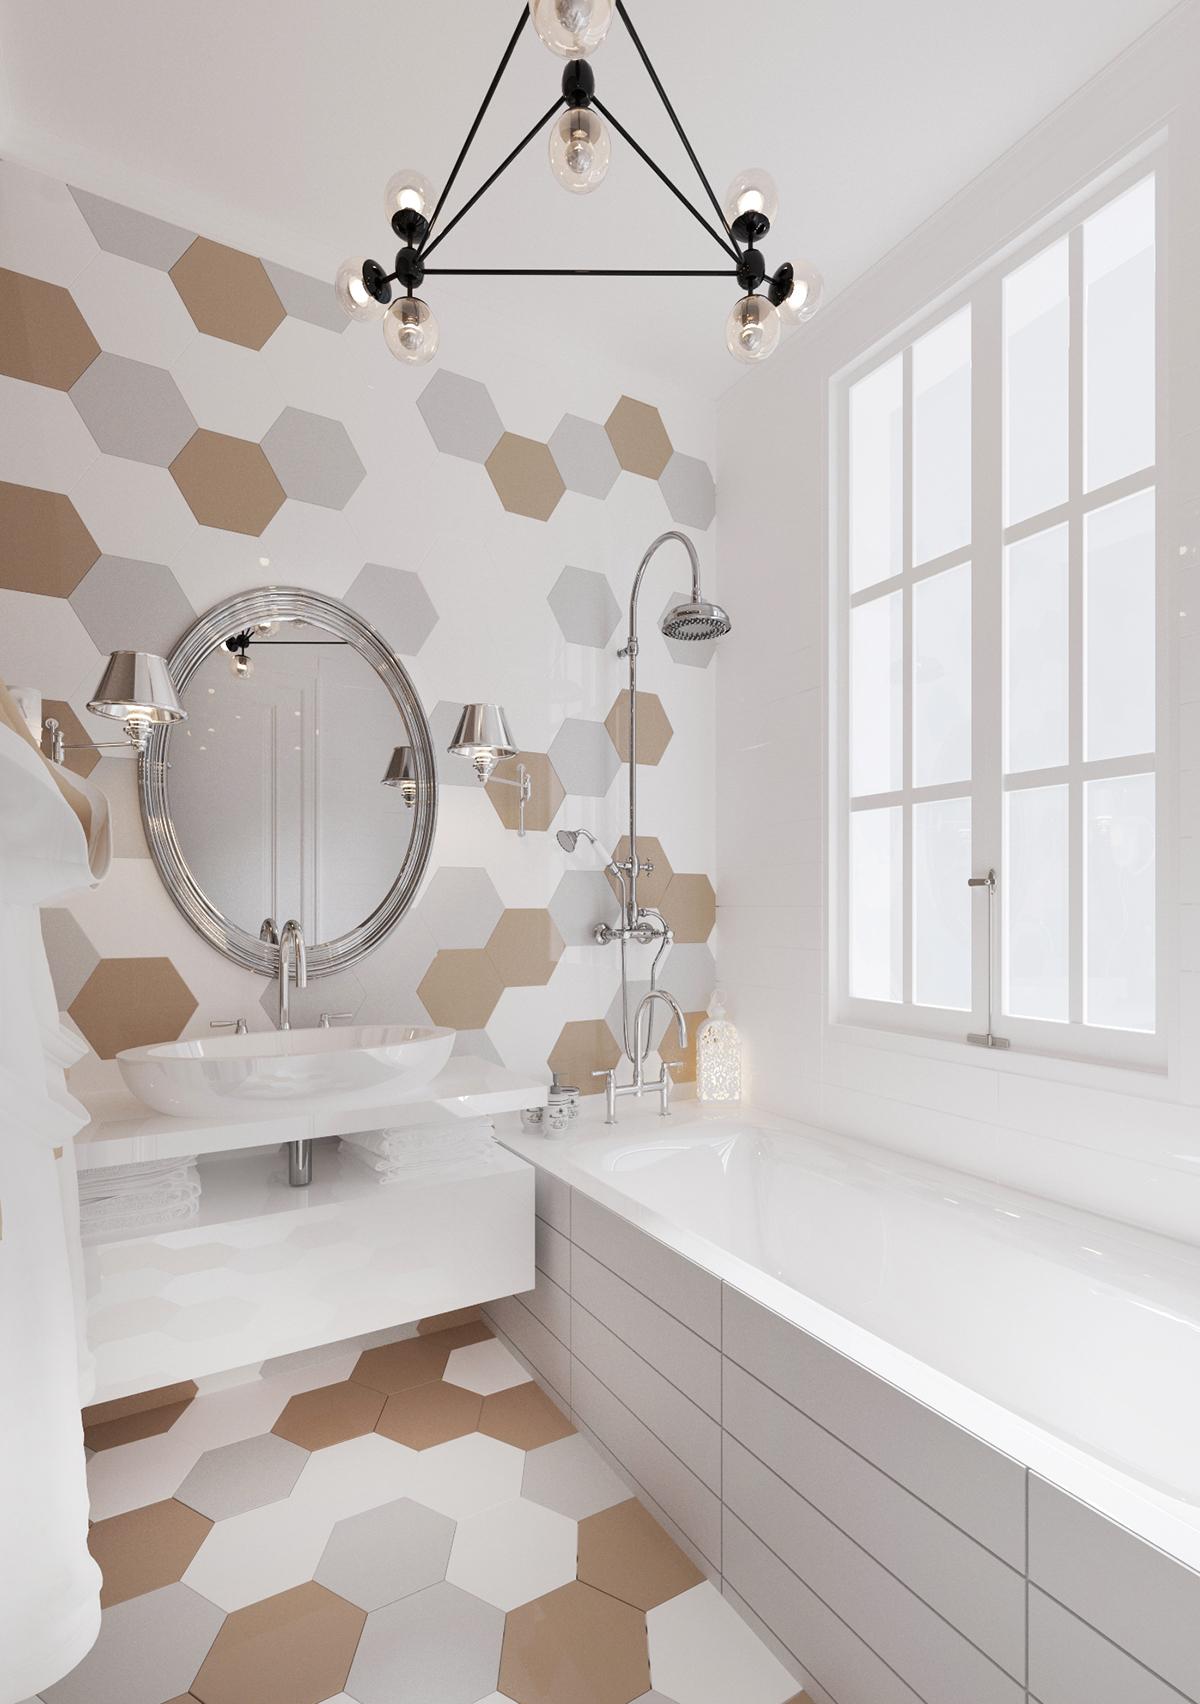 Creative Way To Decorate White Bathroom Designs Beautified ... on White Bathroom Design Ideas  id=44469